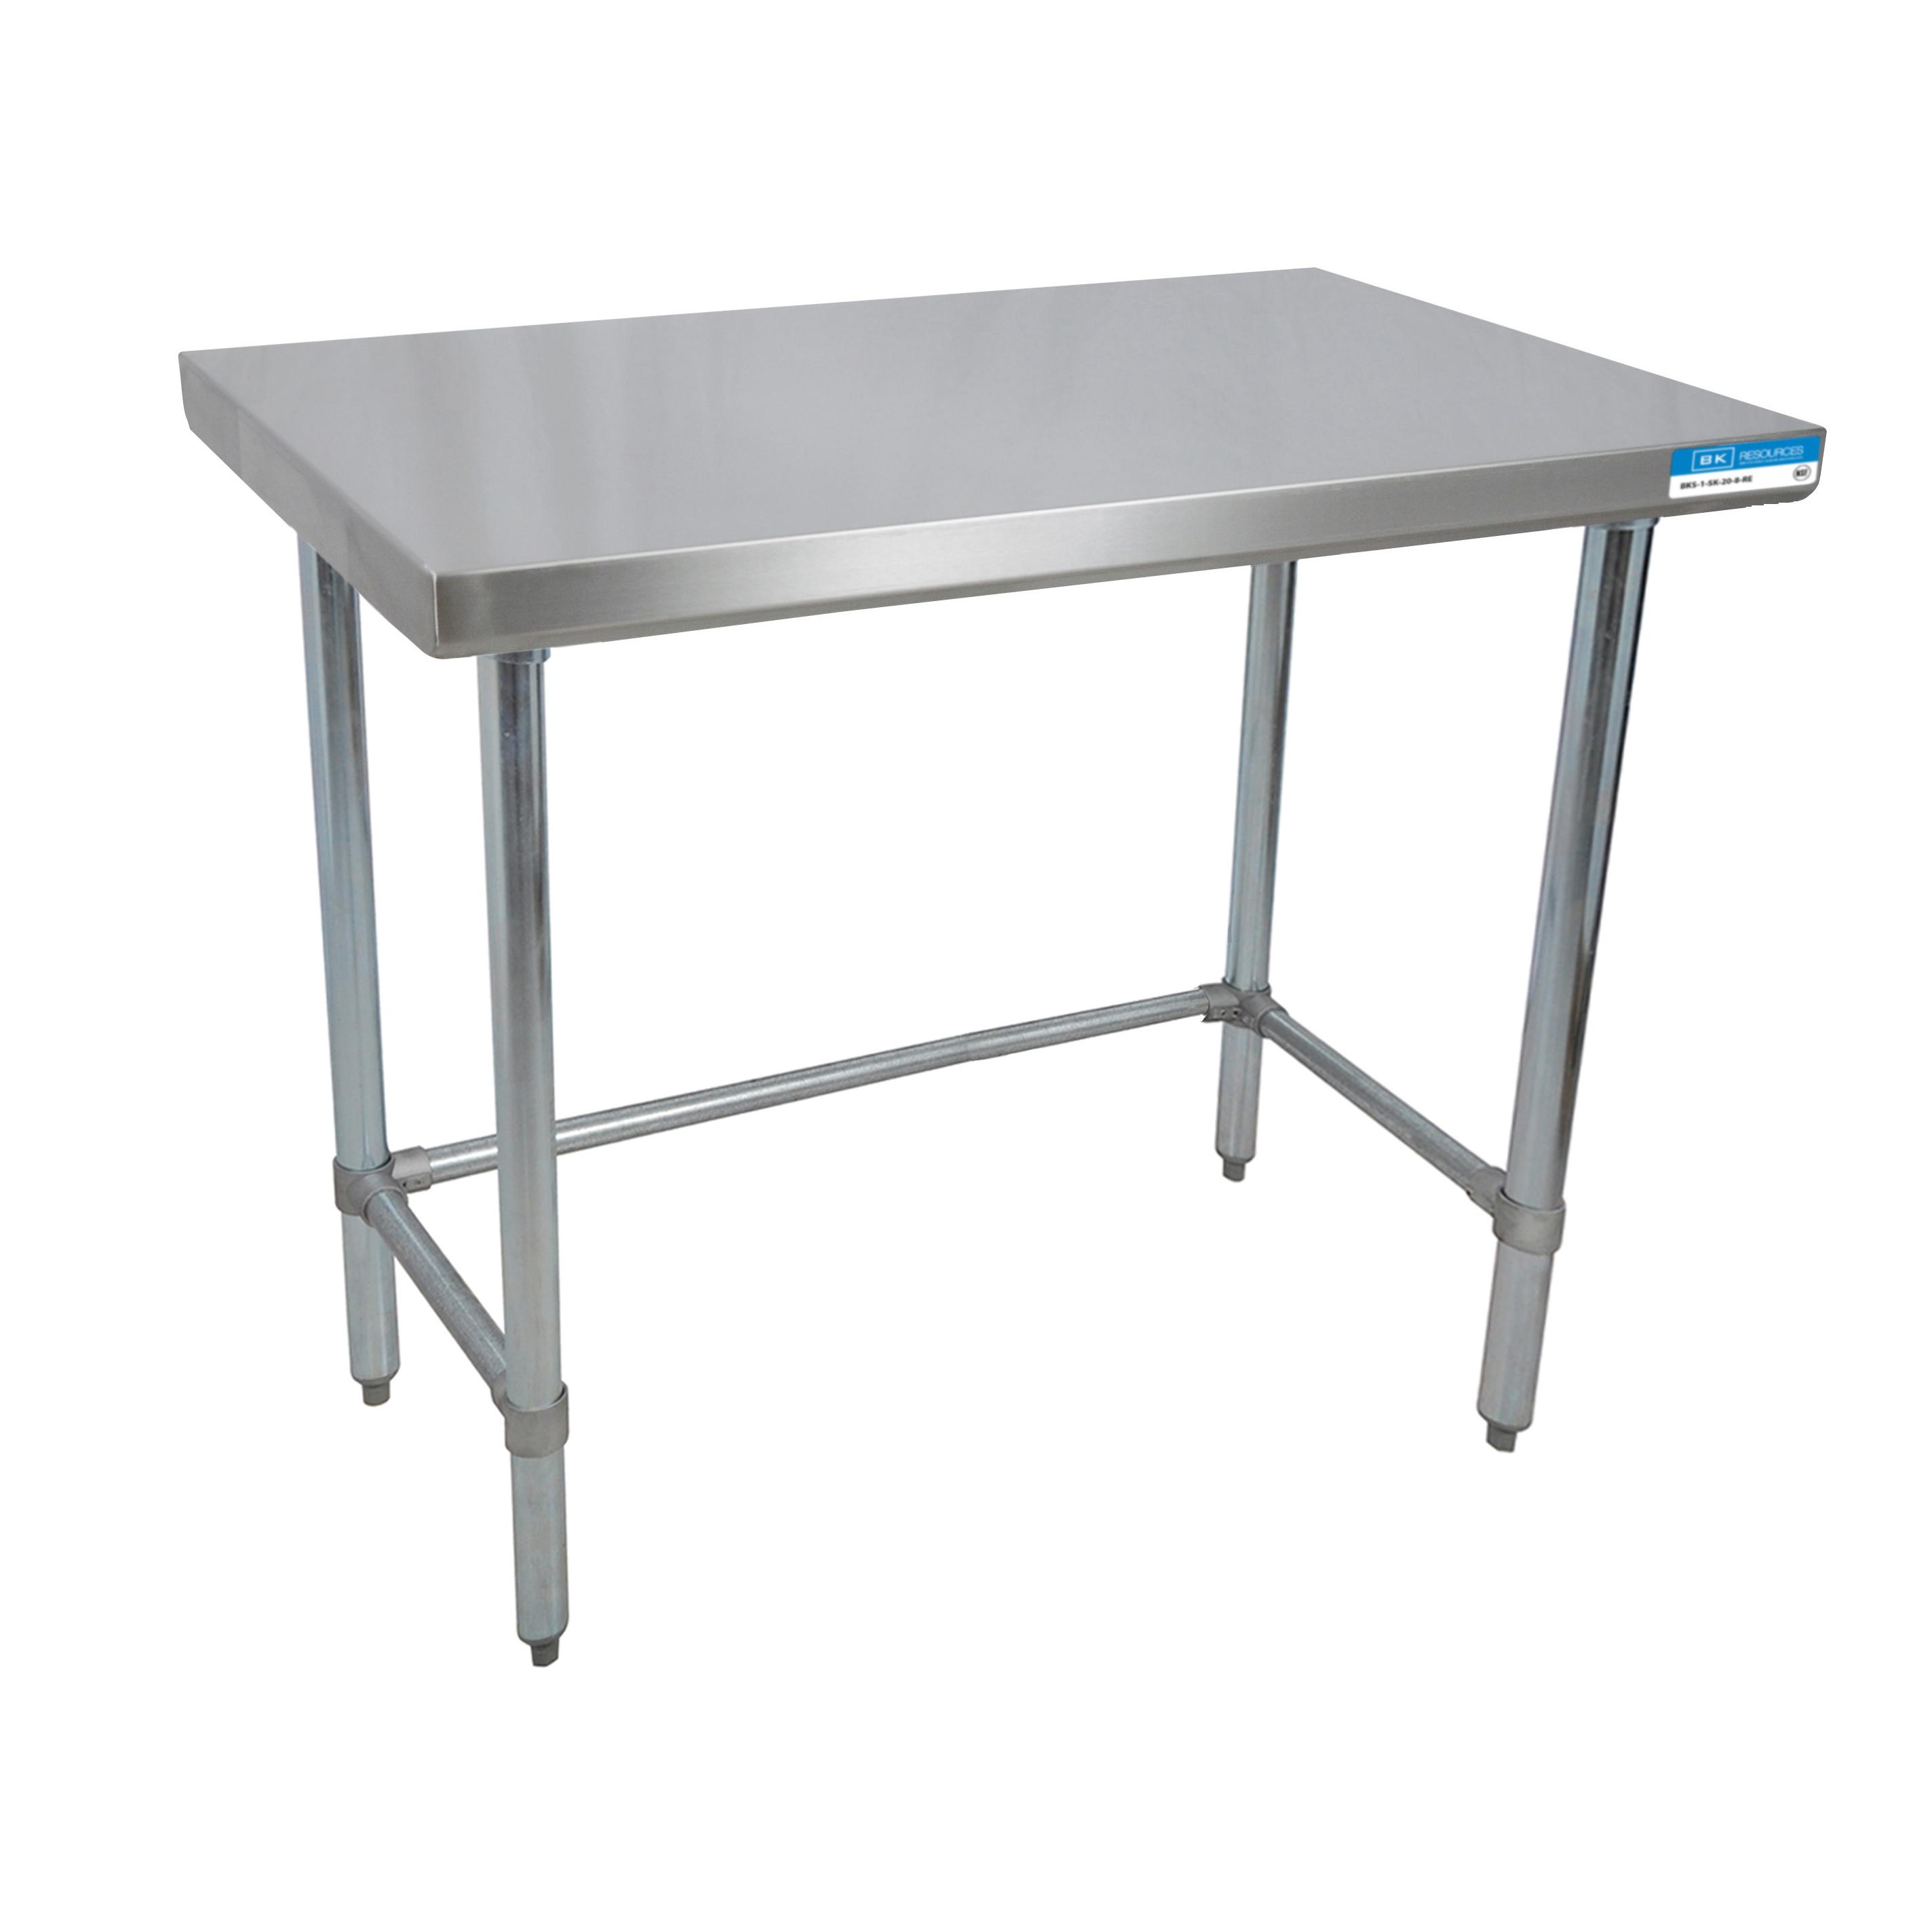 BK Resources QVTOB-2424 work table,  24